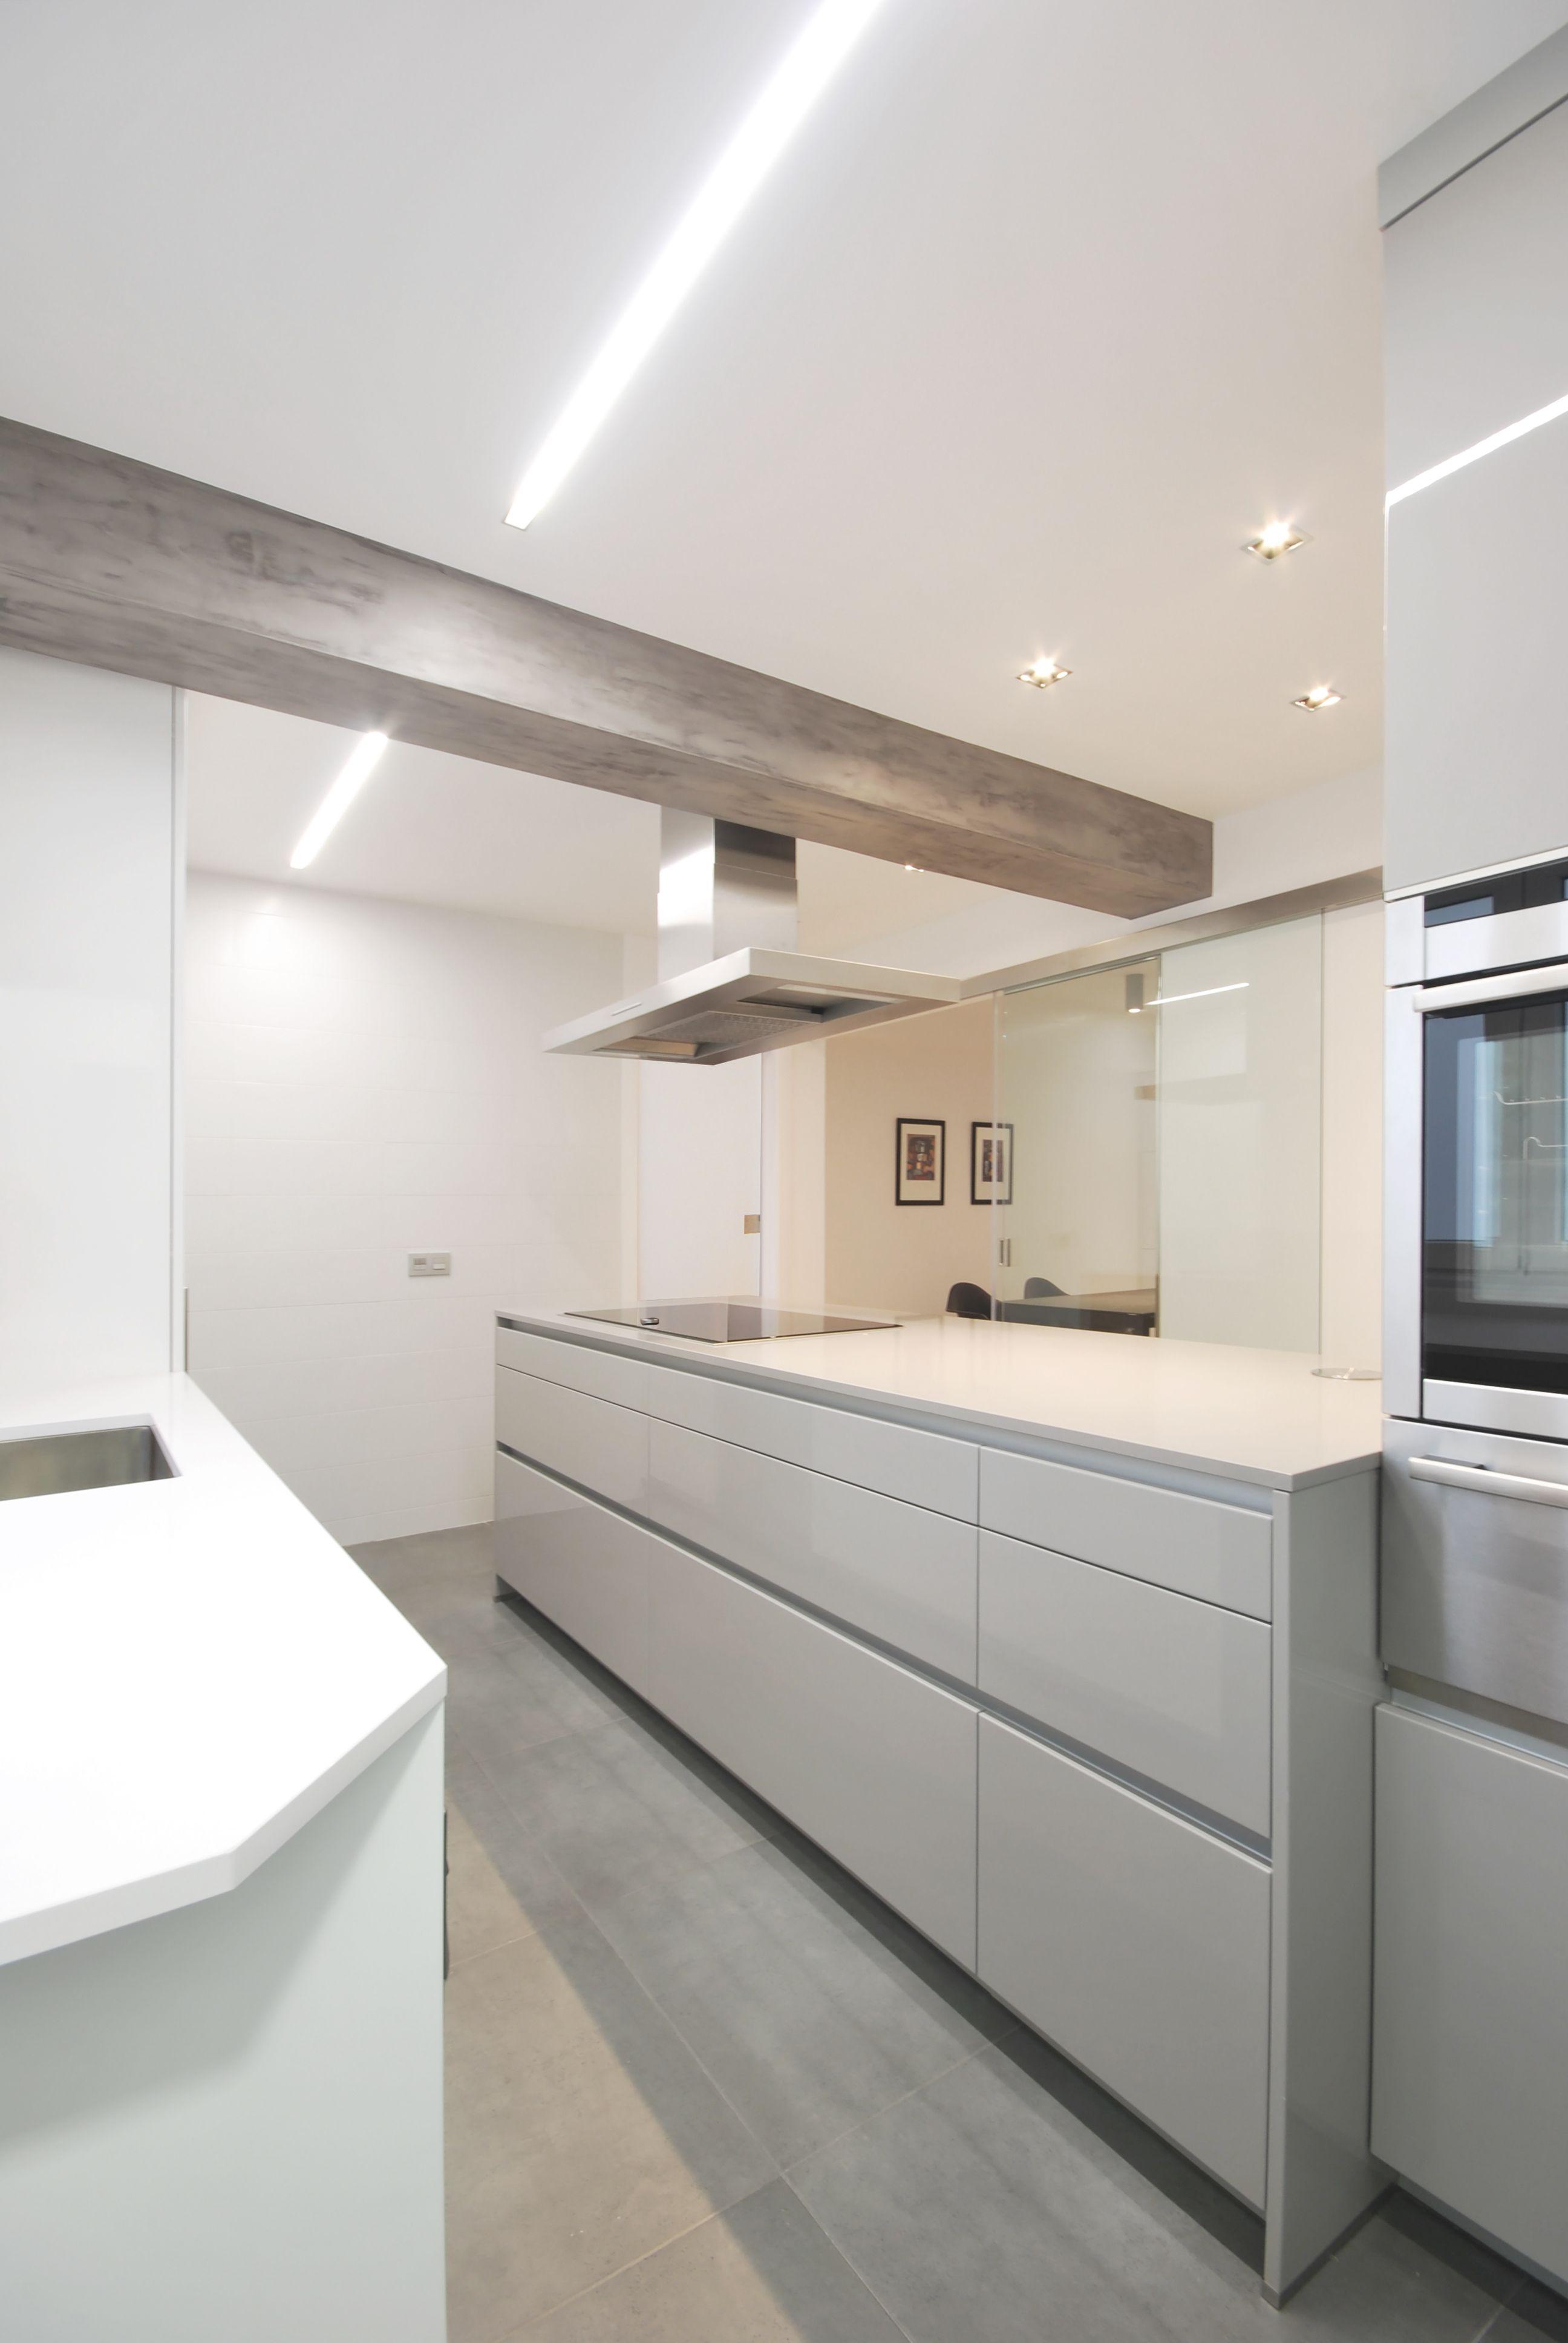 Vicente pillado arquitectura interior interior design cocina